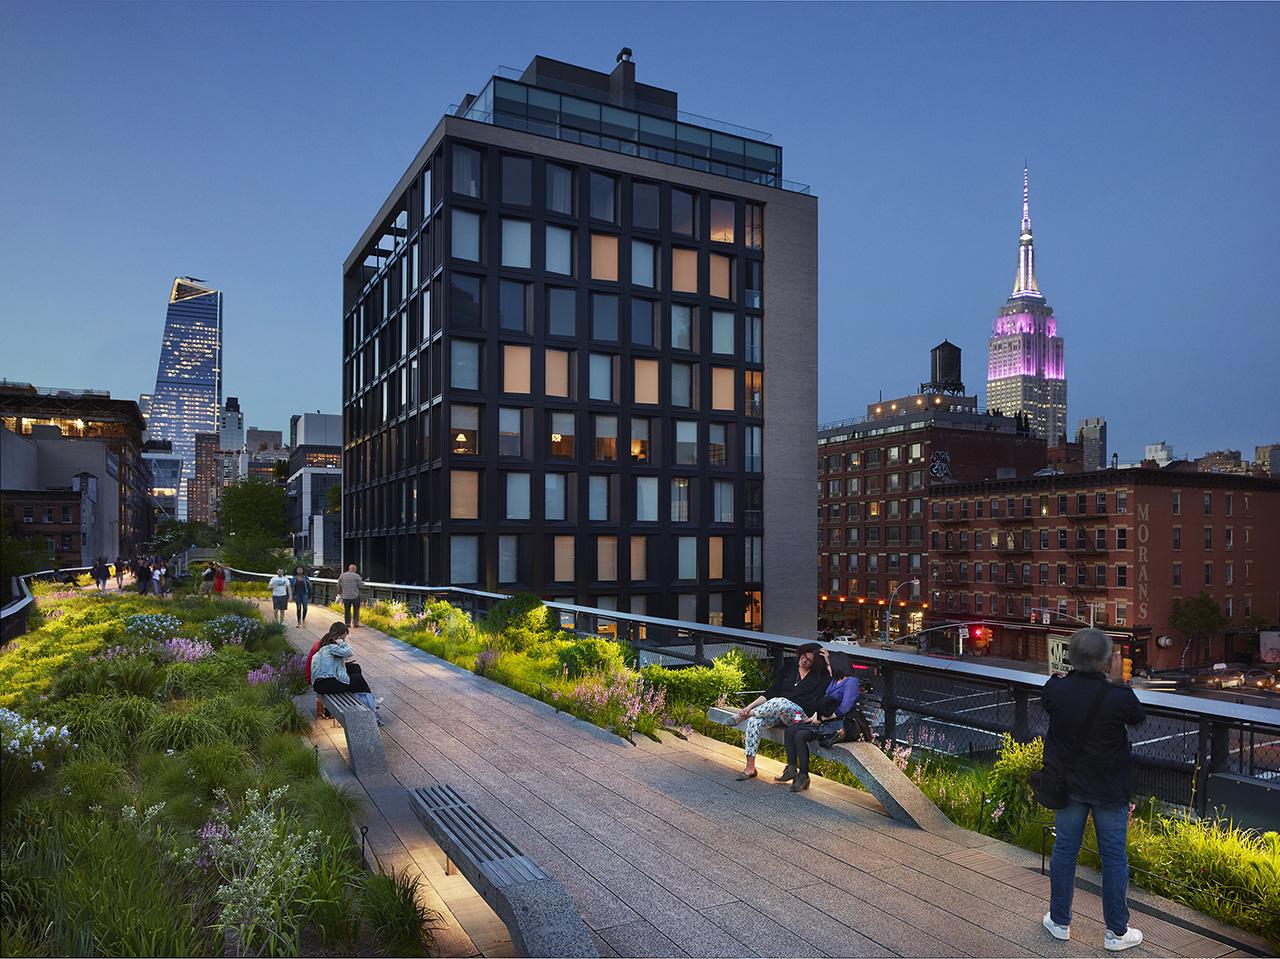 The High Line at dusk